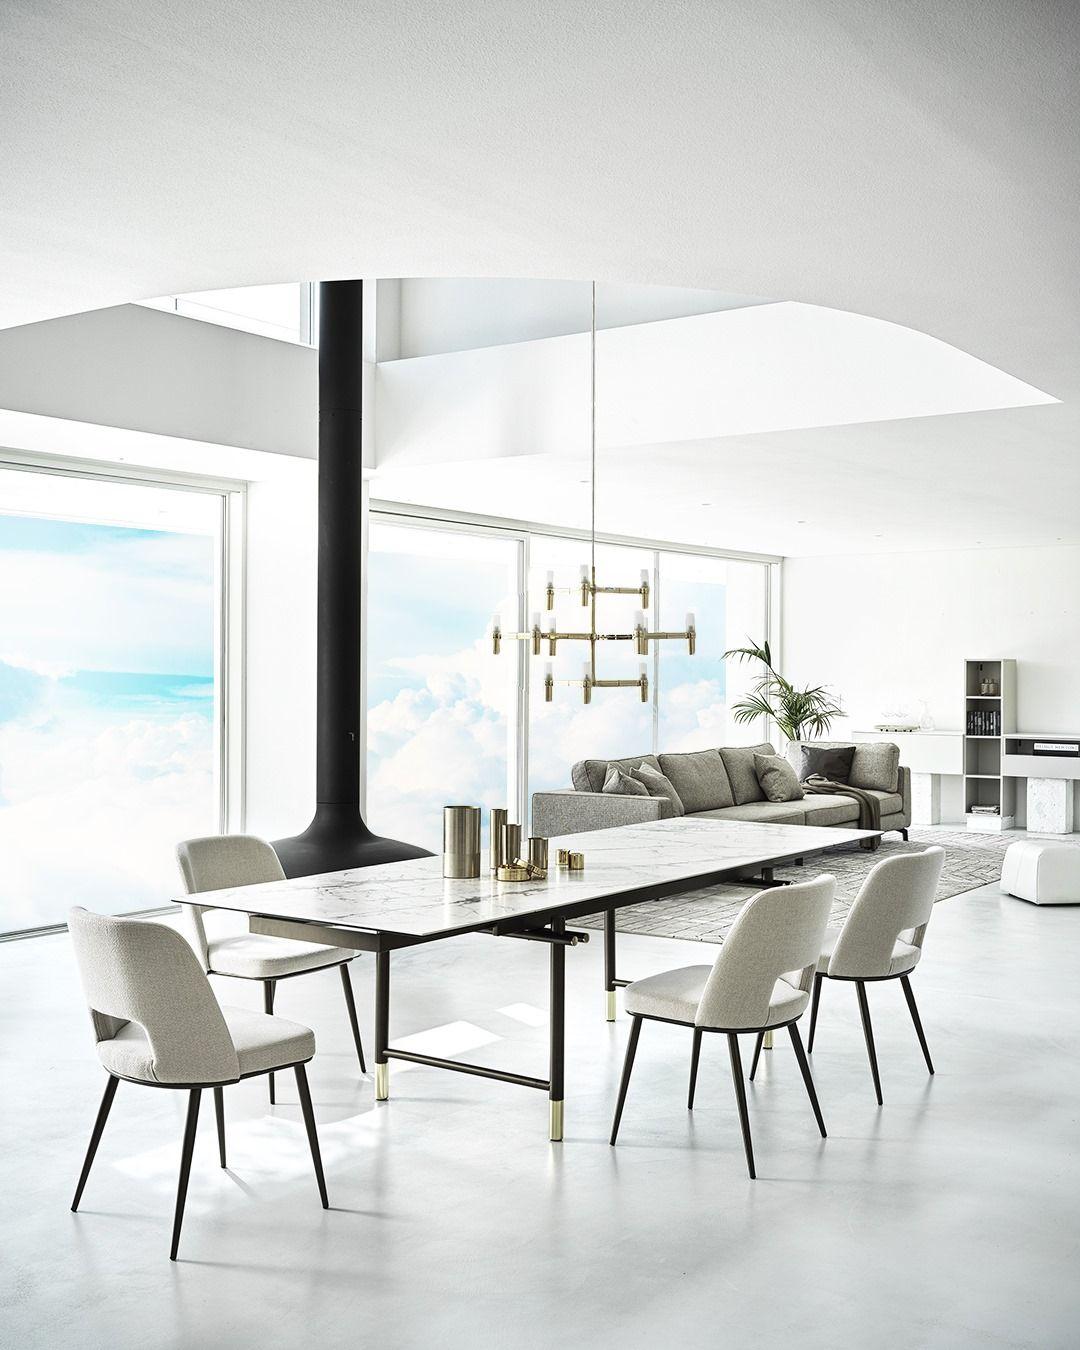 Calligaris No April Fool S Jokes The Extraordina Contemporary Designers Furniture Da Vinci Lifestyle In 2020 Calligaris Contemporary Furniture Design Furniture Styles